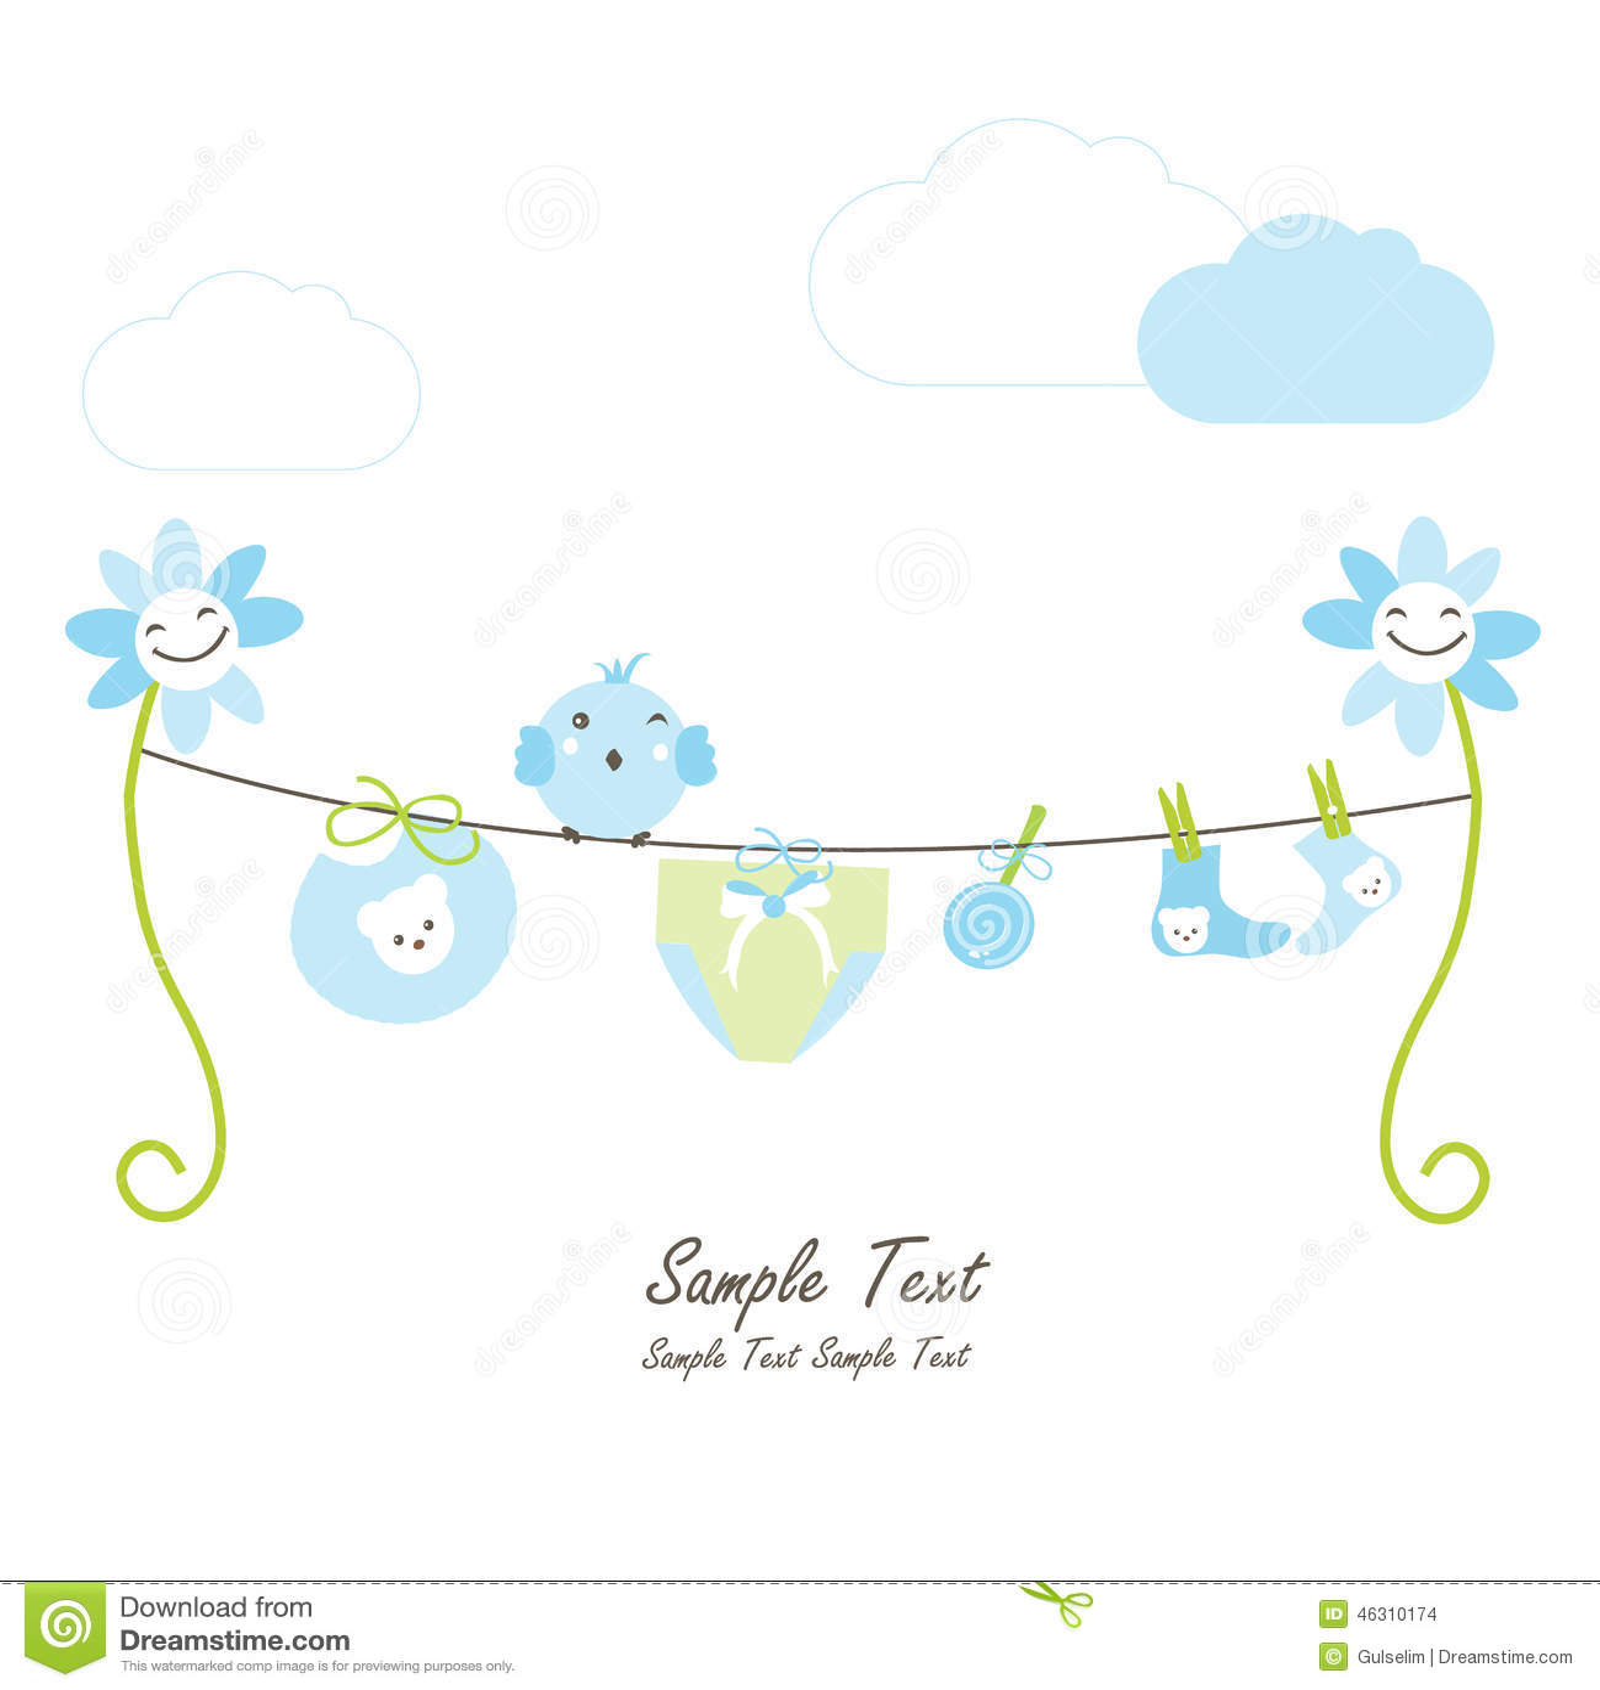 Newborn baby boy flowers and hanging baby symbols stock vector newborn baby boy flowers and hanging baby symbols biocorpaavc Images